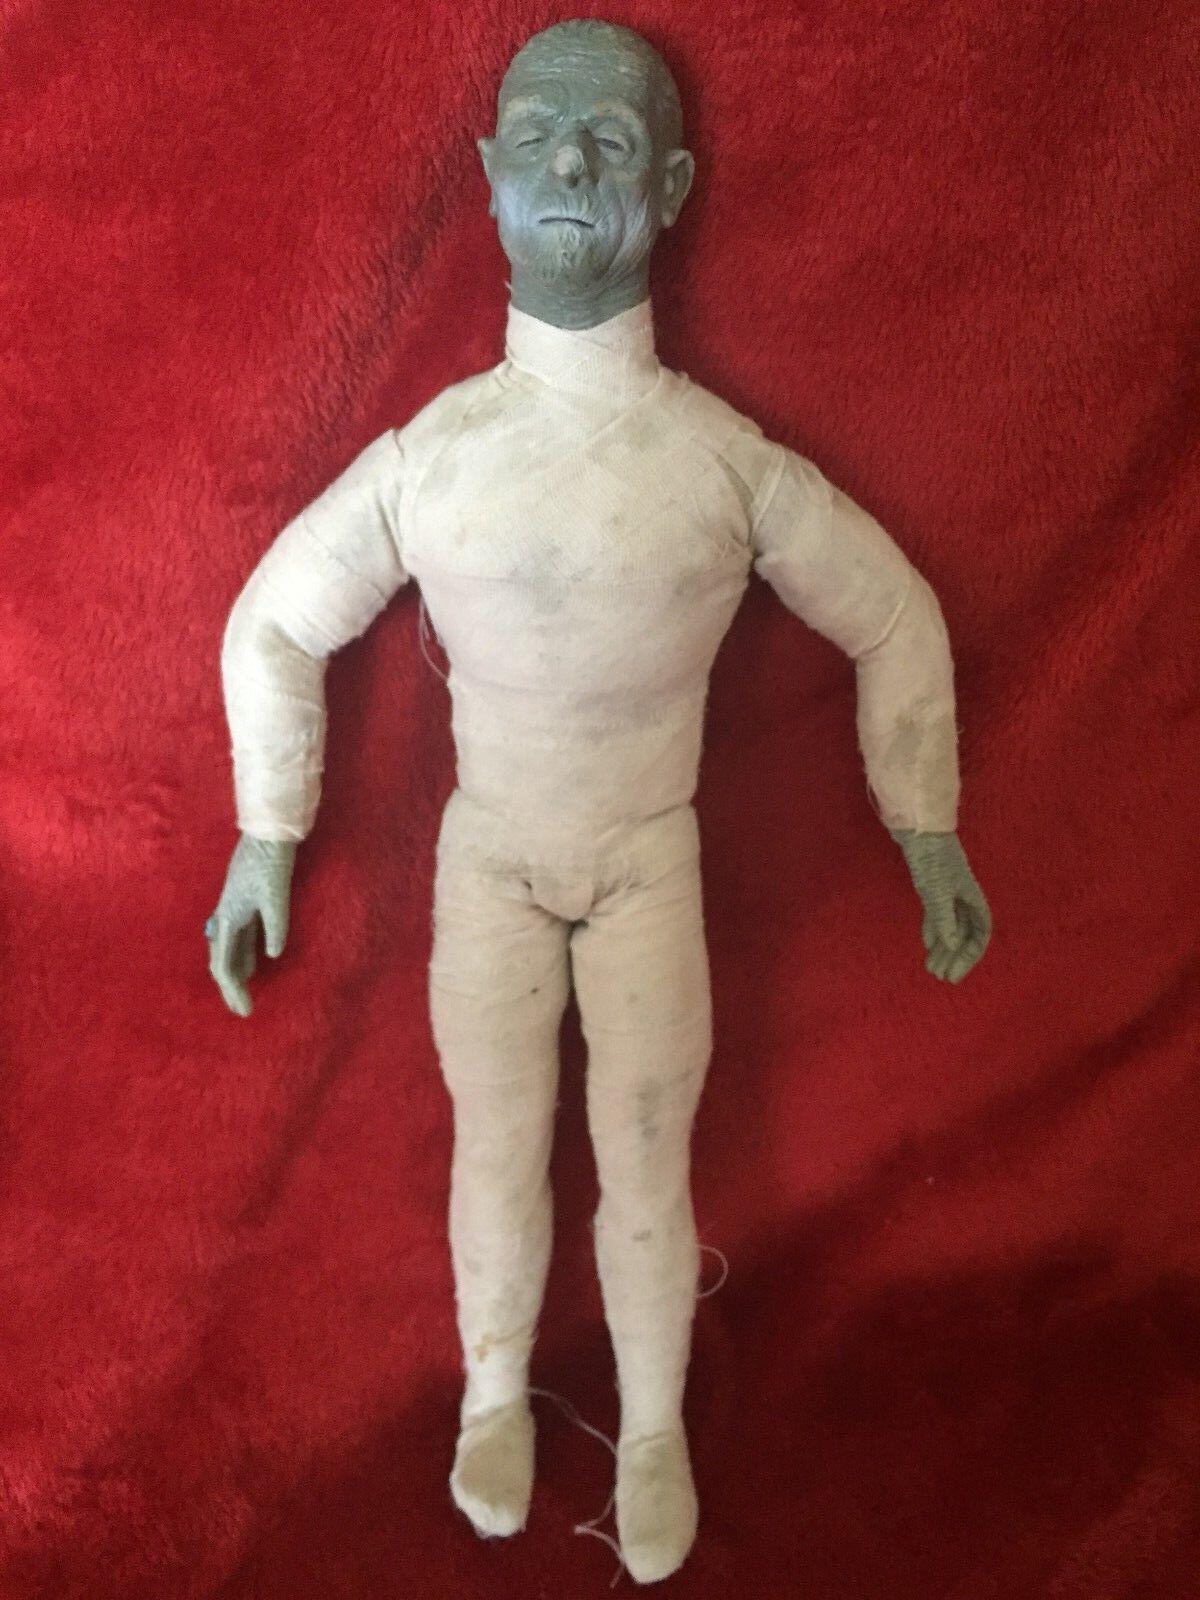 Boris Karloff The Mummy Doll Kenner  70955 30cm